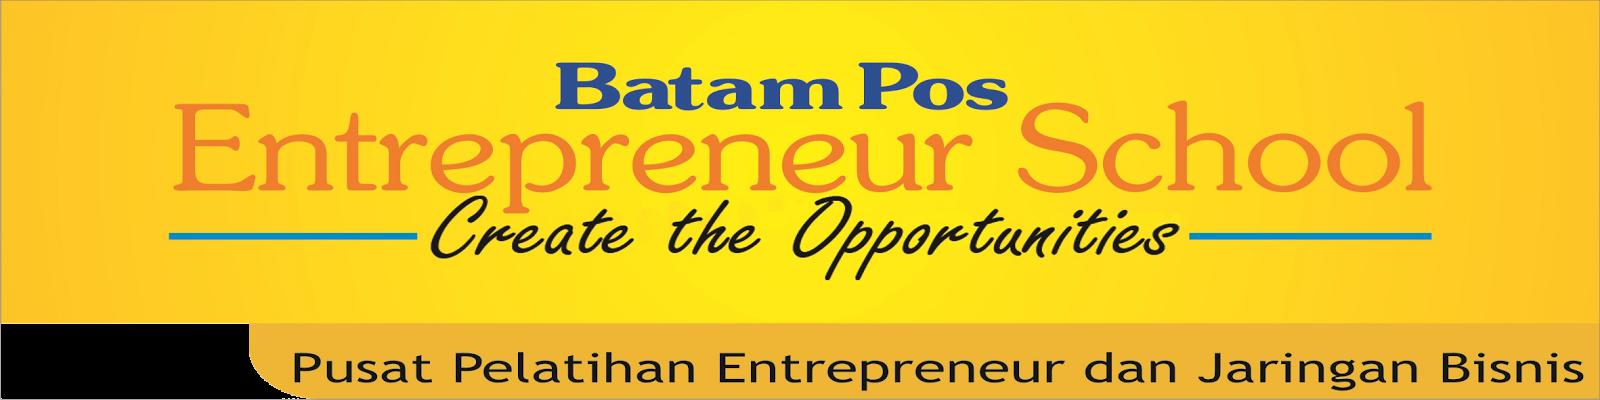 Batam Pos Entrepreneur School